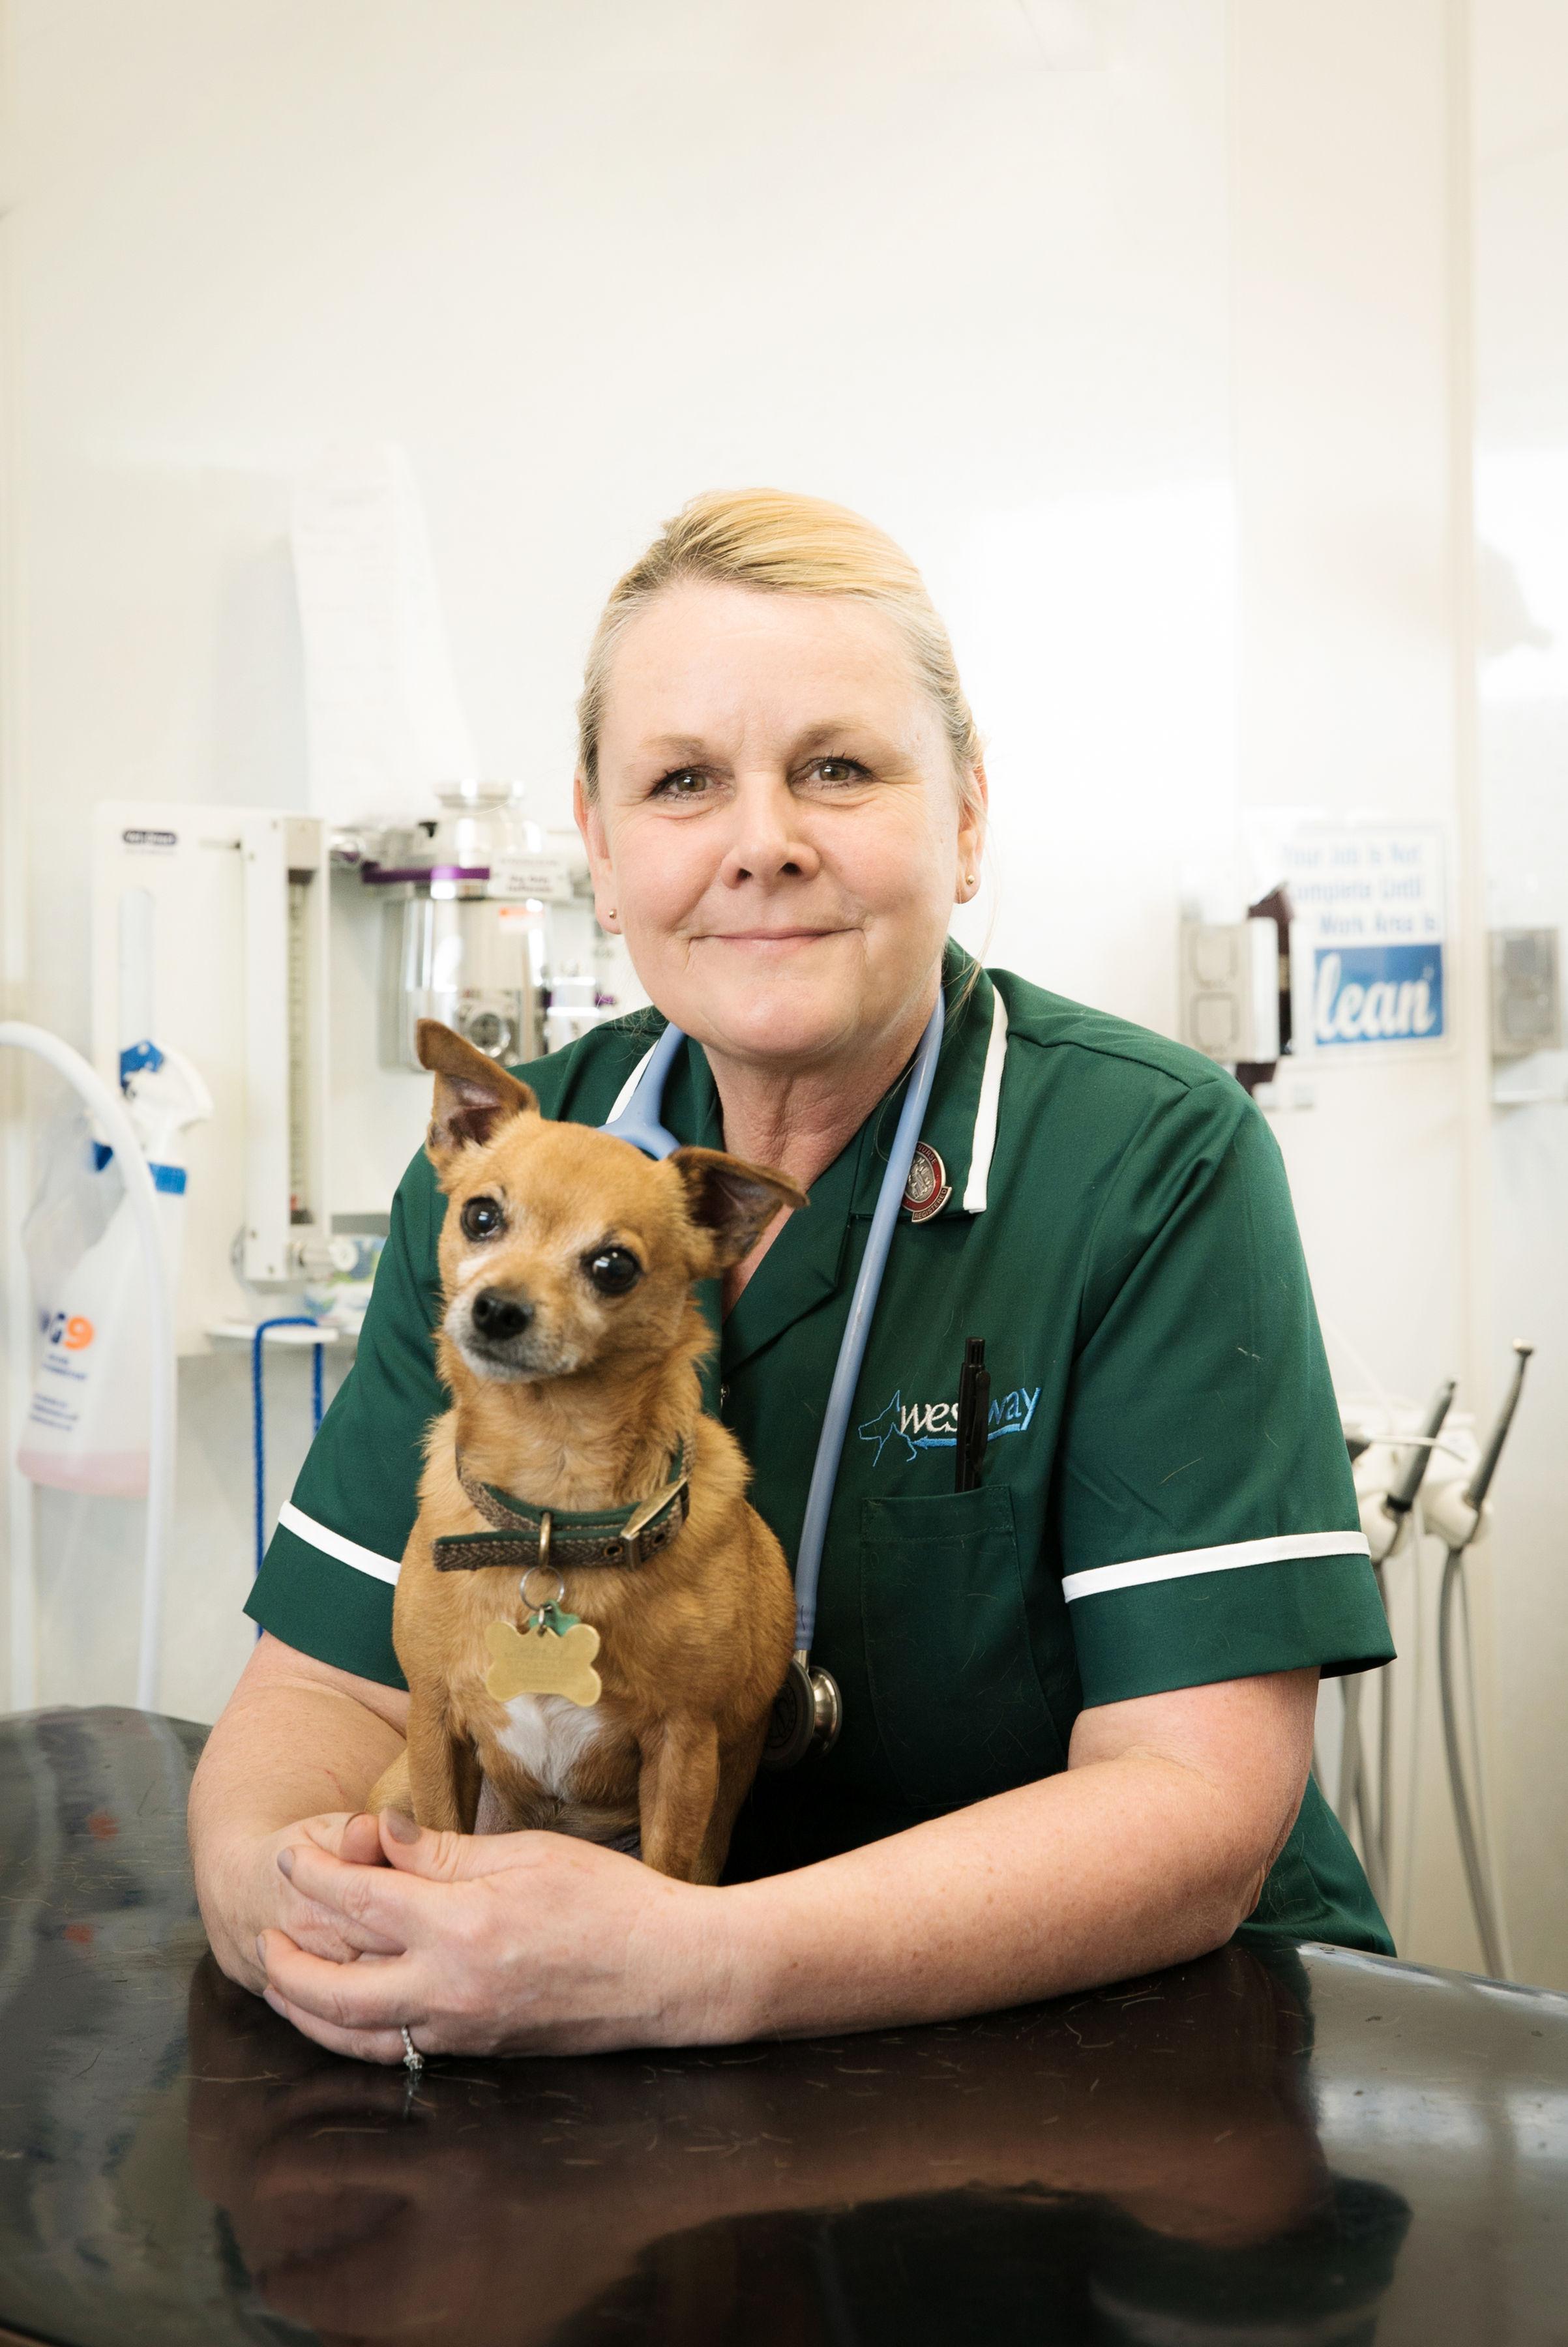 Westway Veterinary Group, Sunderland - Sunderland, Tyne and Wear SR4 7YB - 01915 659455 | ShowMeLocal.com